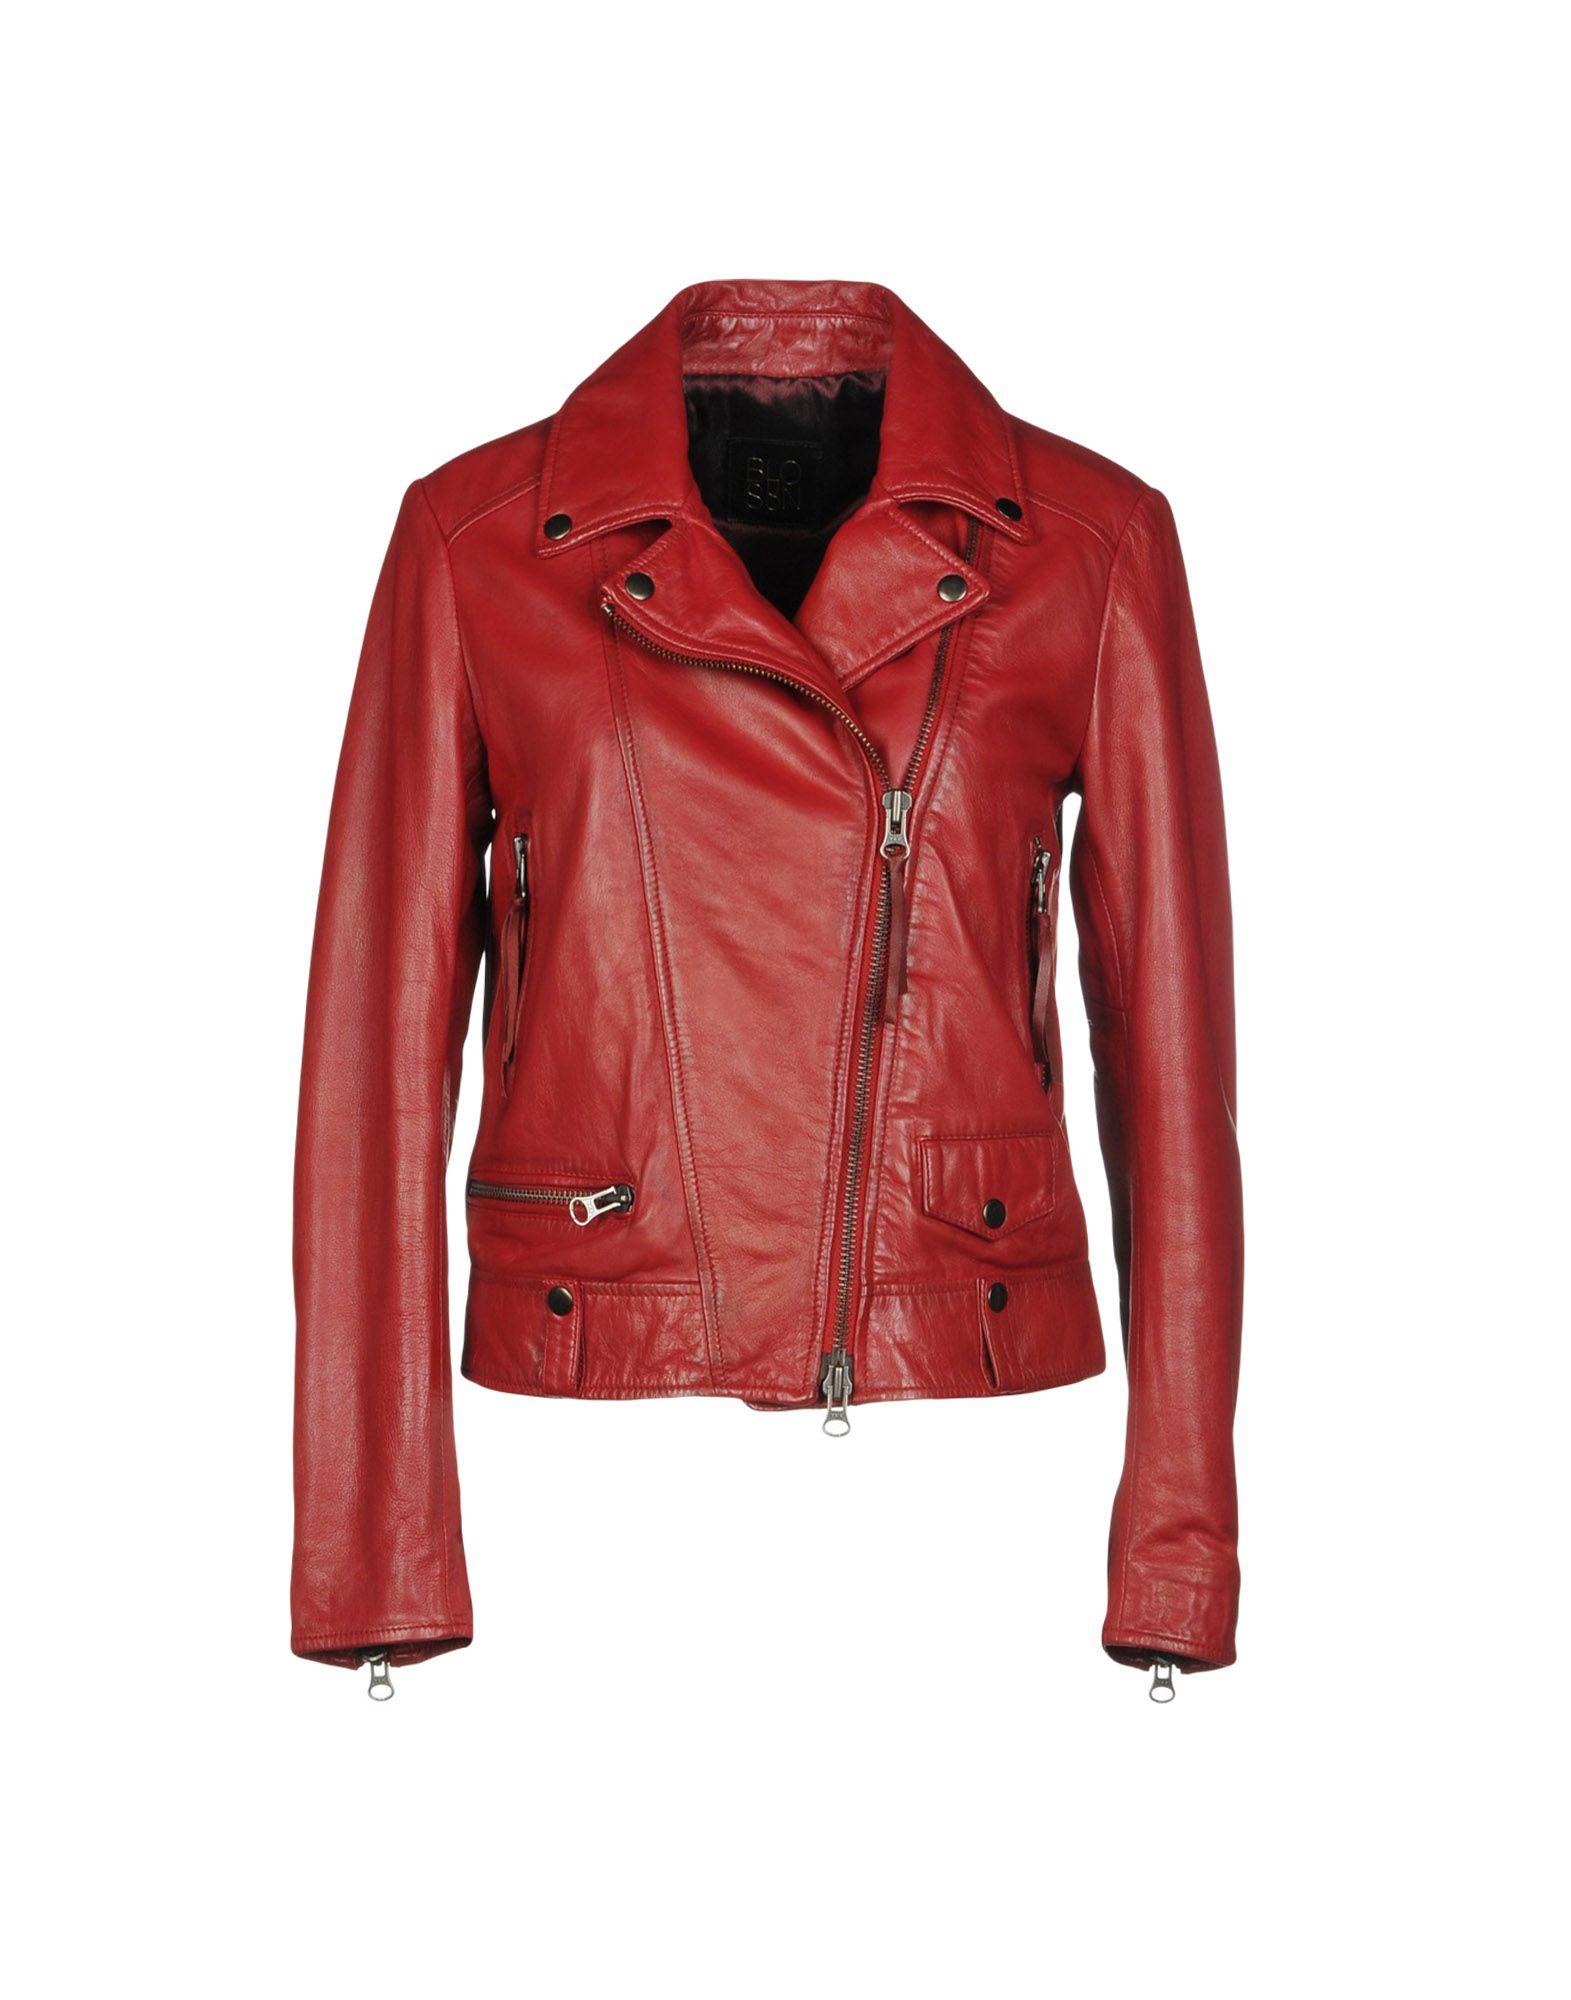 BLOUSON Куртка betsy adam new lt grey sequin bottom blouson dress 8 msrp $179 00